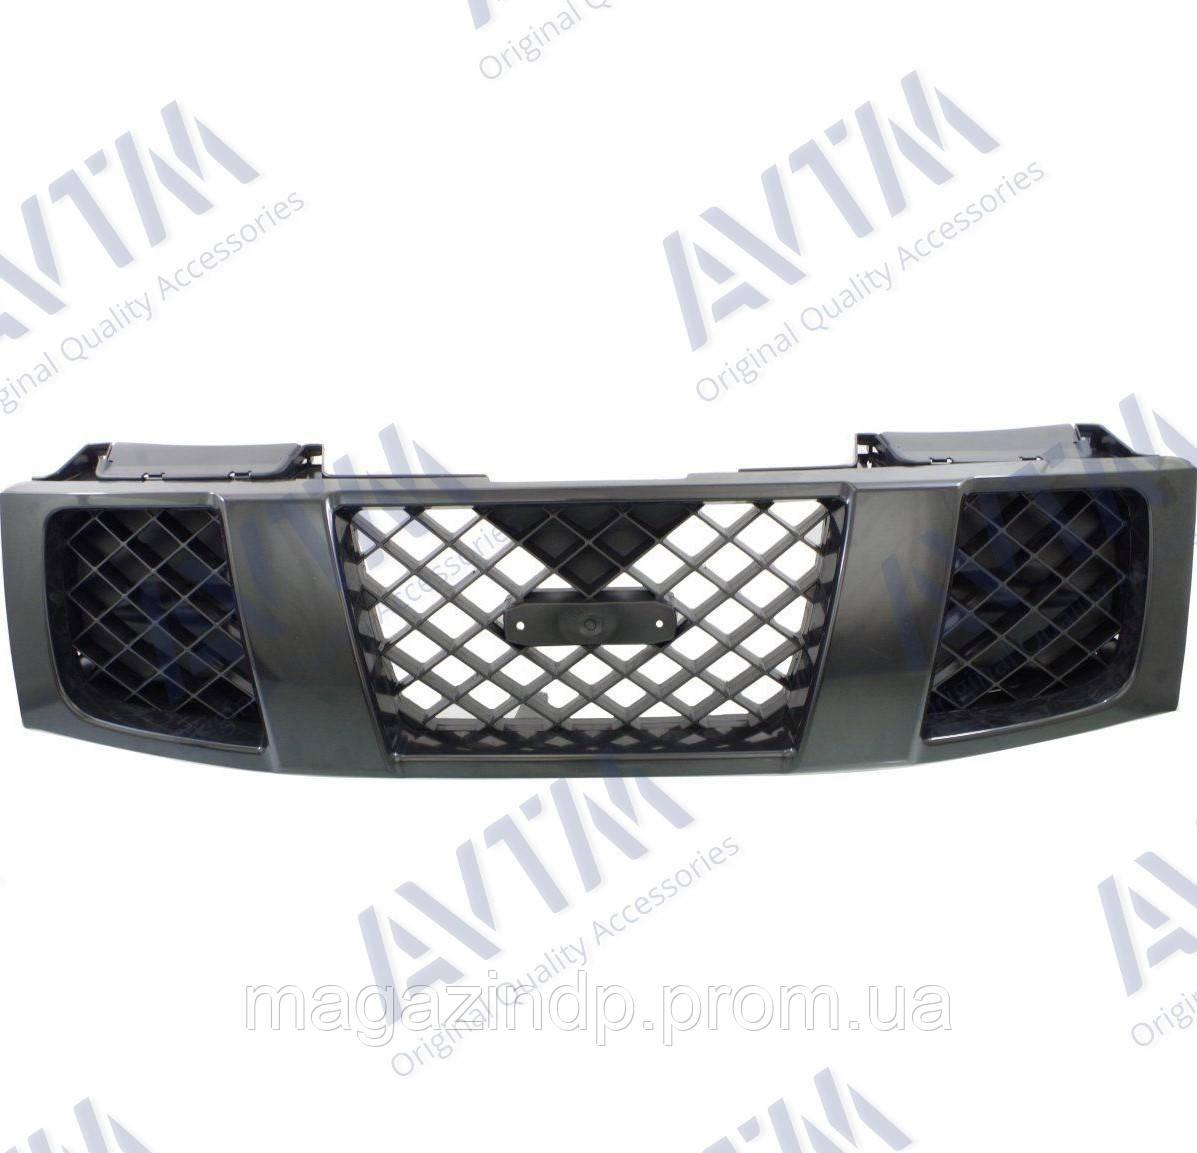 Решетка радиатора Nissan Arm 2005-2015 черн. Код товара: 3800083